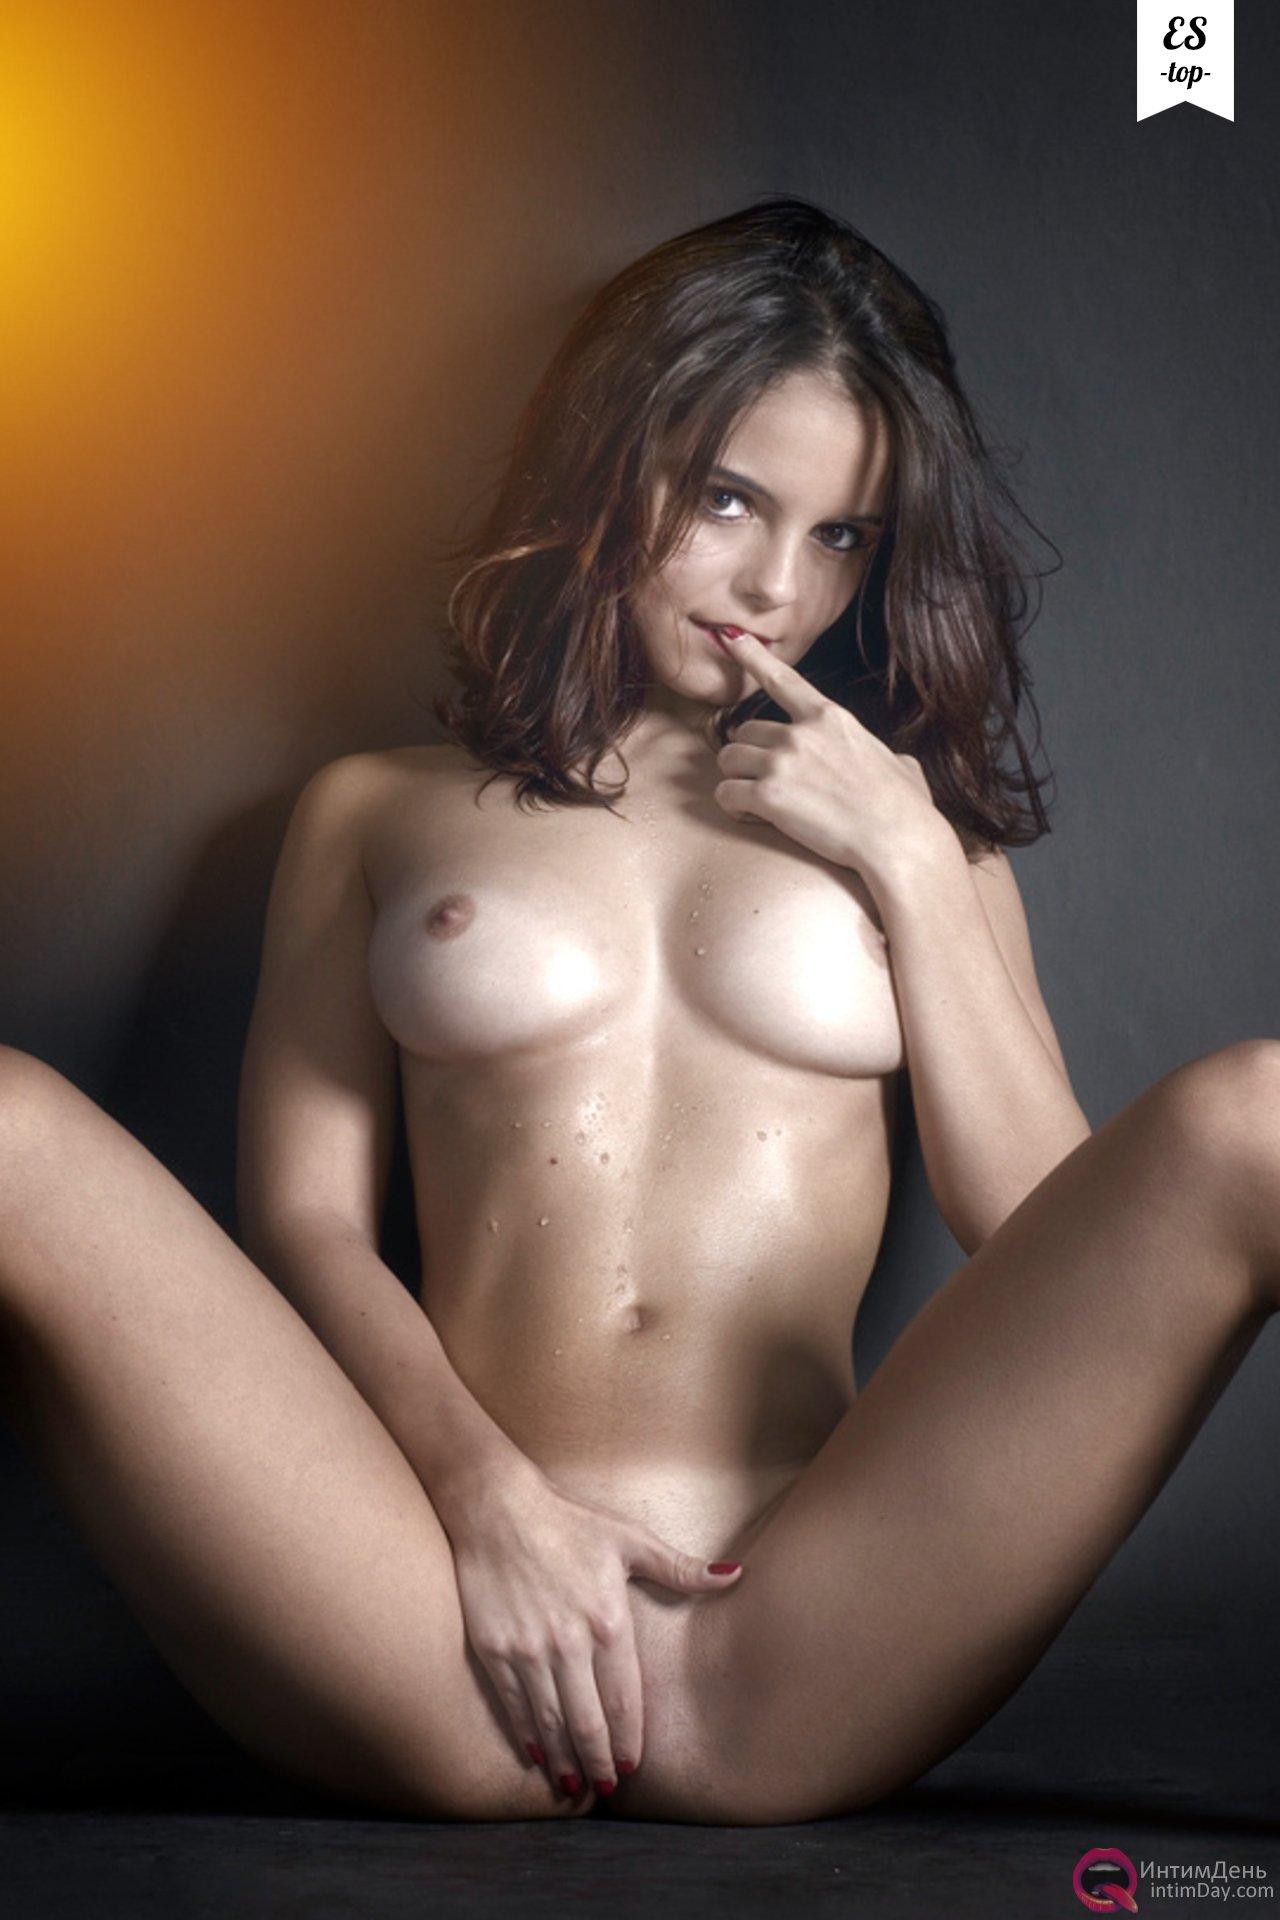 Проститутки индивидуалки г владивосток влад секс нет